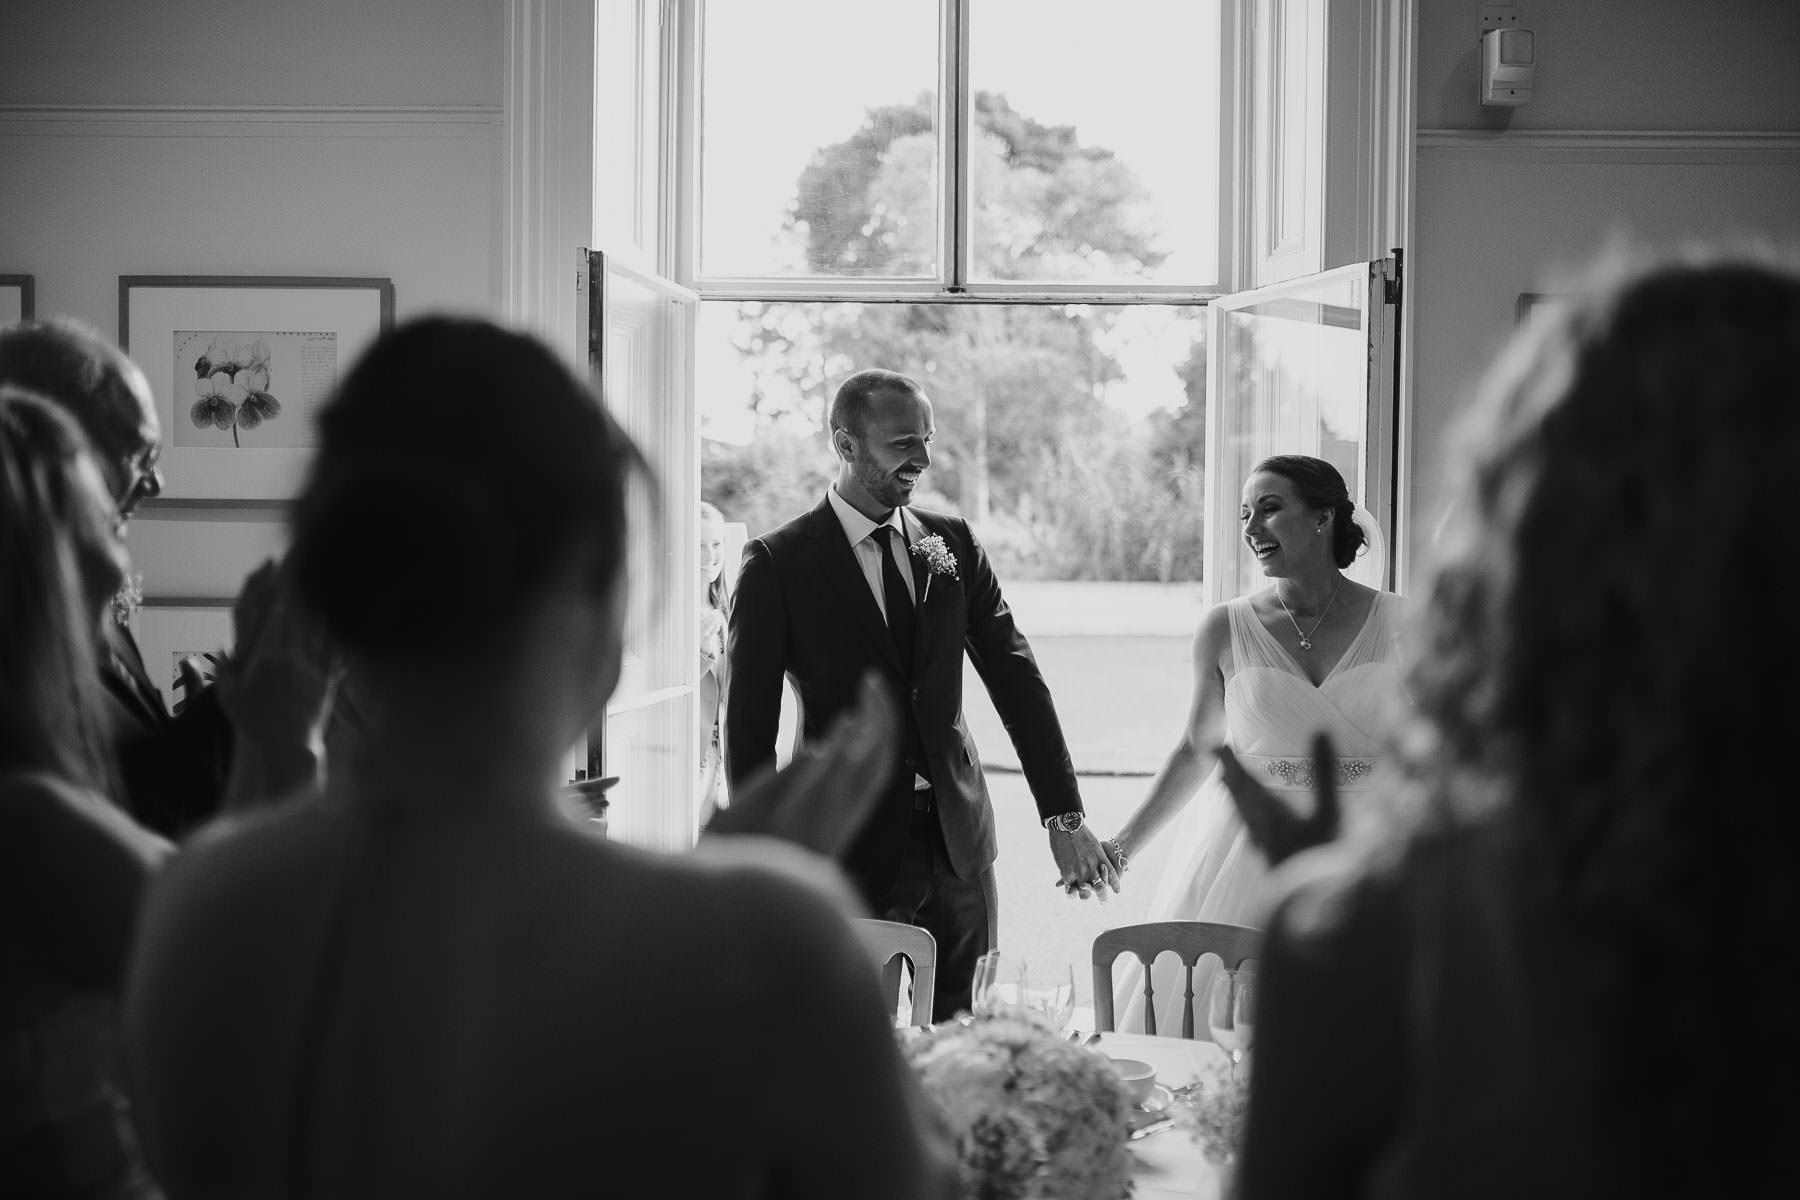 kew gardens wedding photography astra duncan49